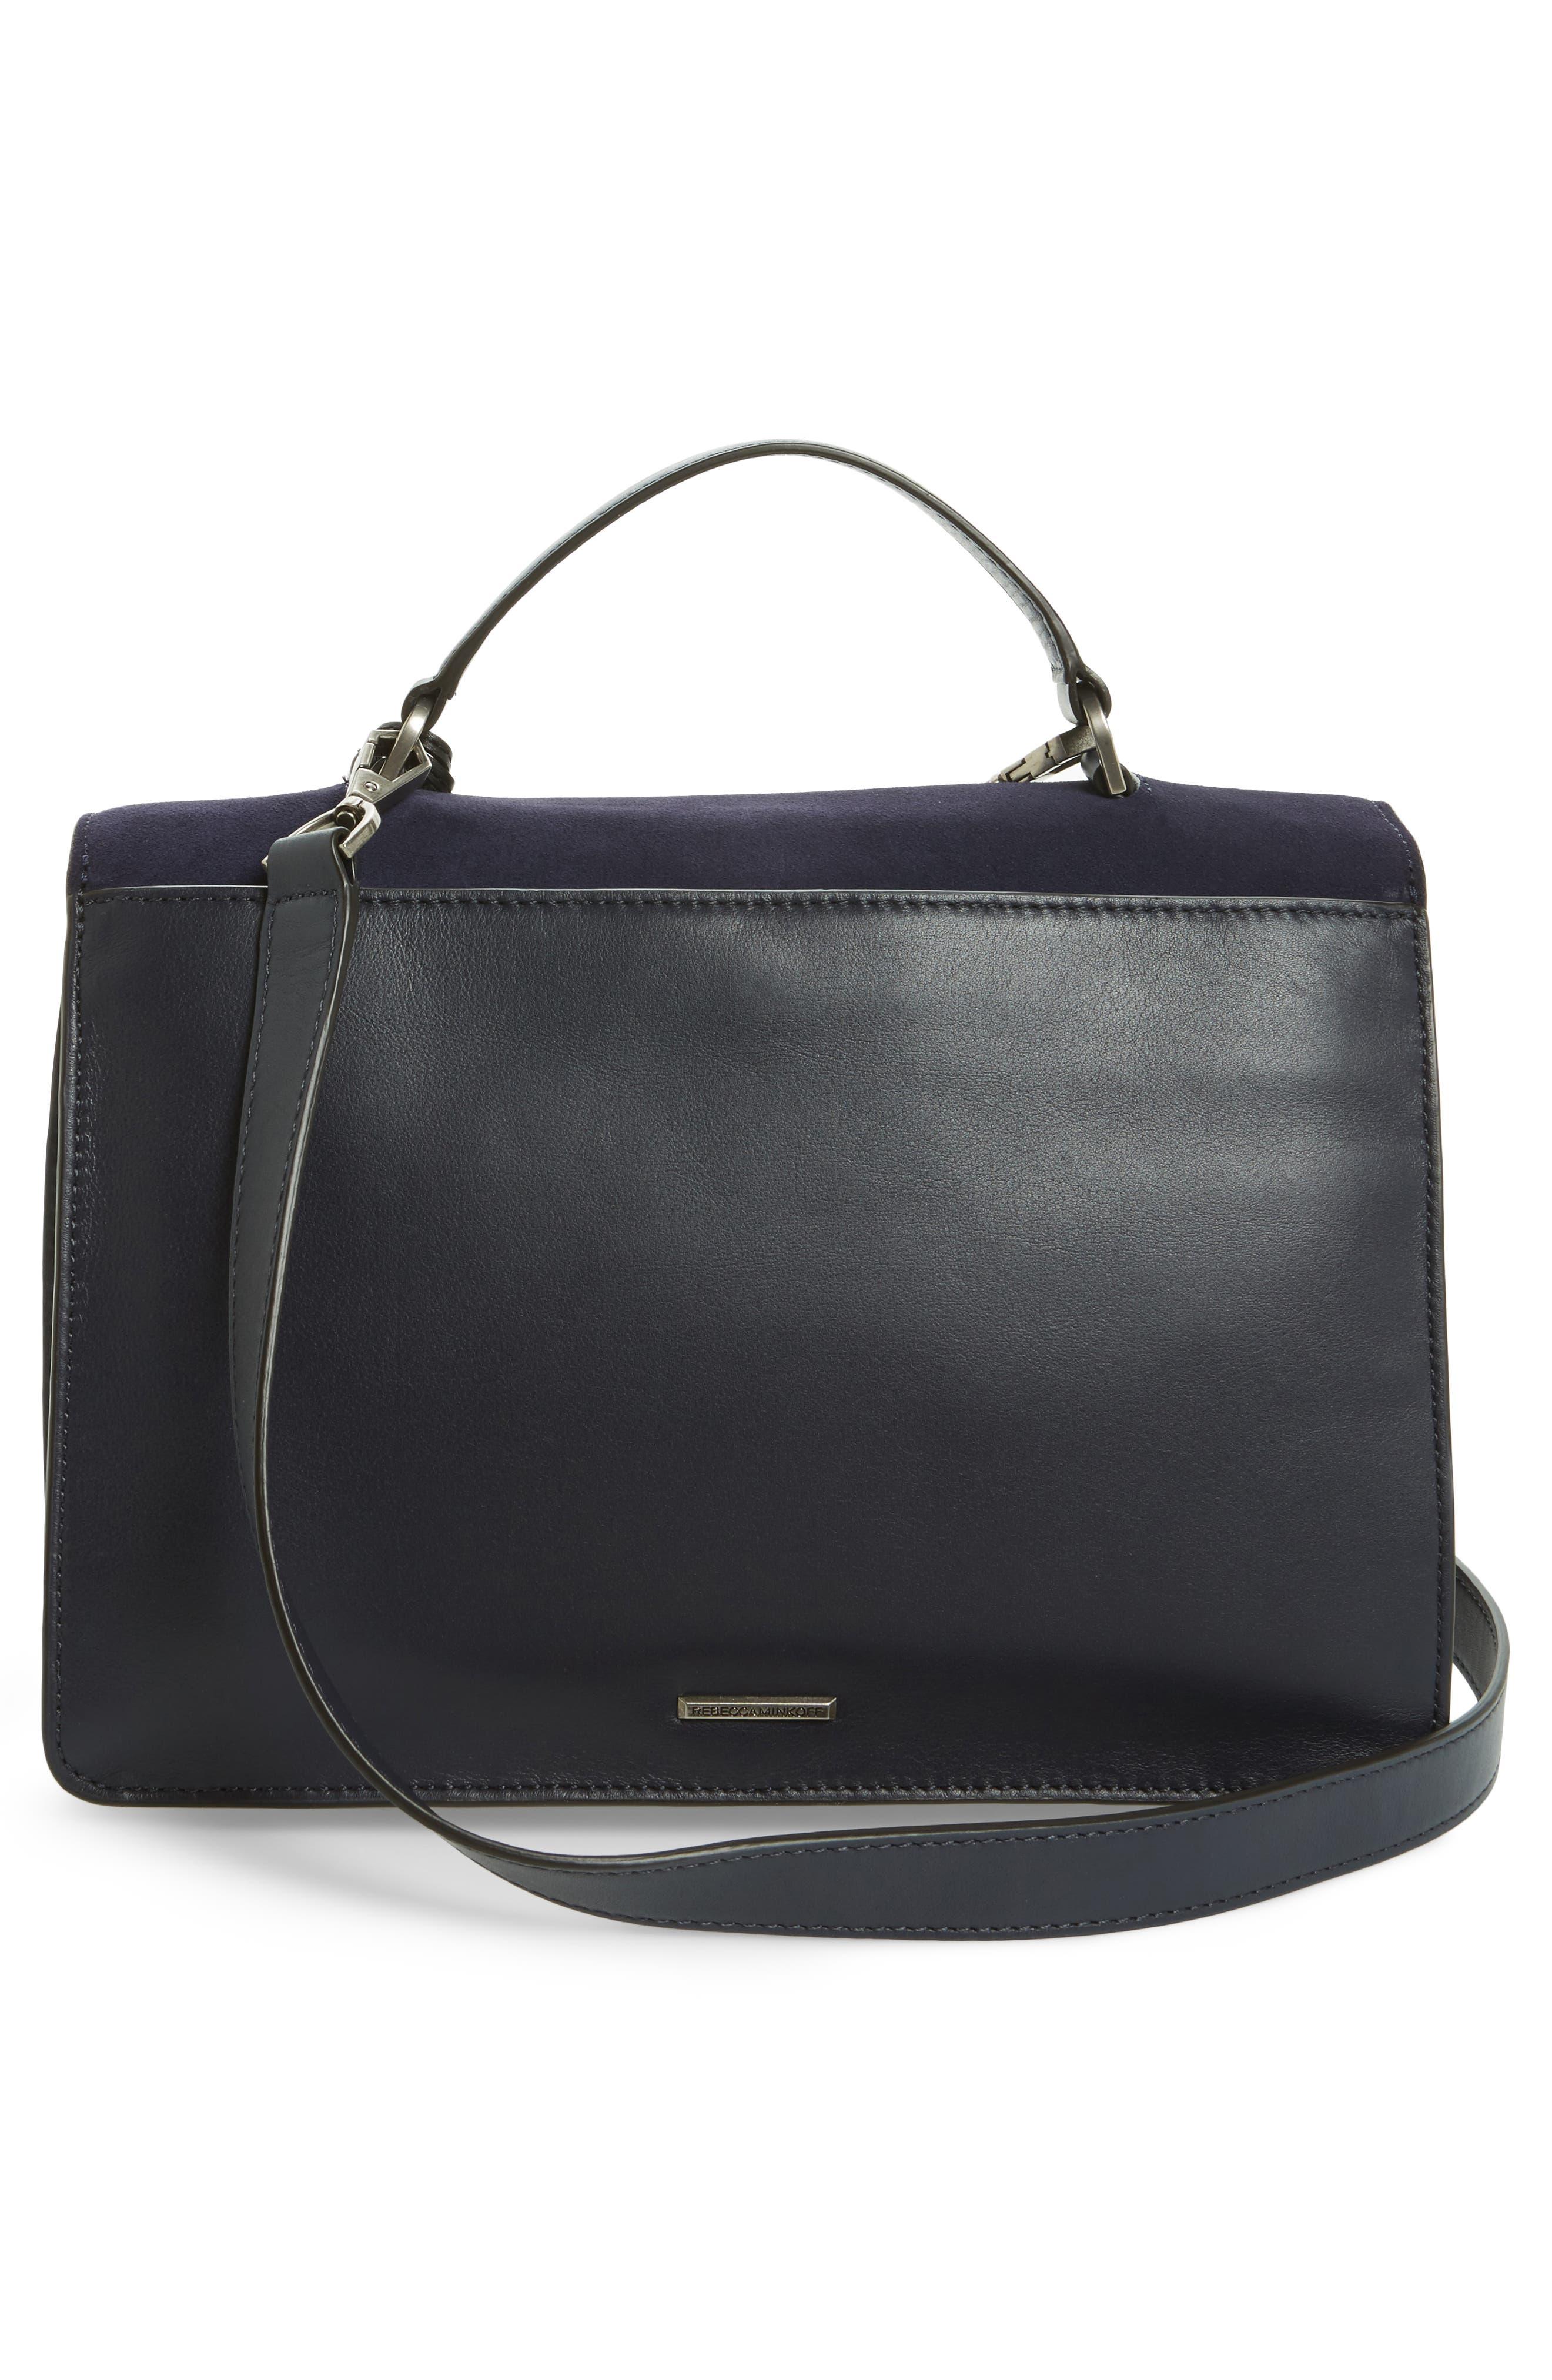 Top Handle Shoulder Bag,                             Alternate thumbnail 3, color,                             Black